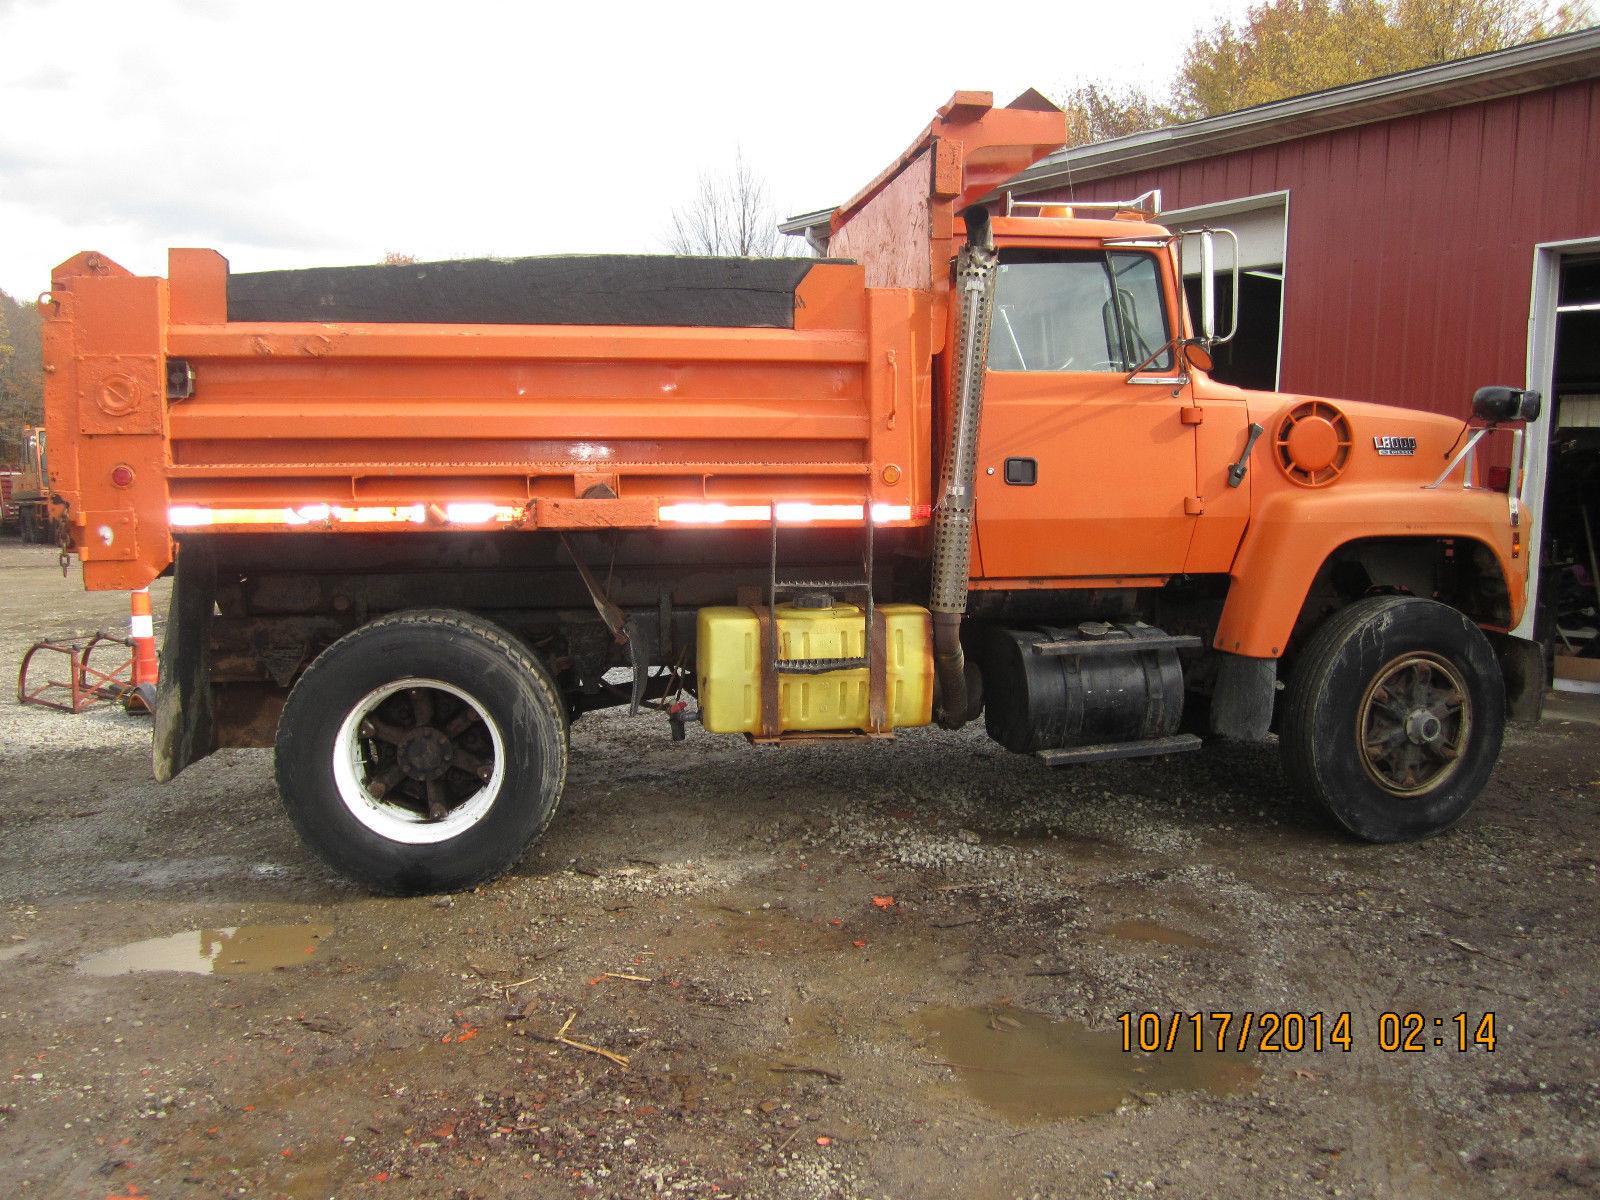 Heavy Duty Truck For Sale Ohio >> 1994 FORD L8000 DIESEL AUTO ALLISON TRANS DUMP TRUCK NICE SHAPE